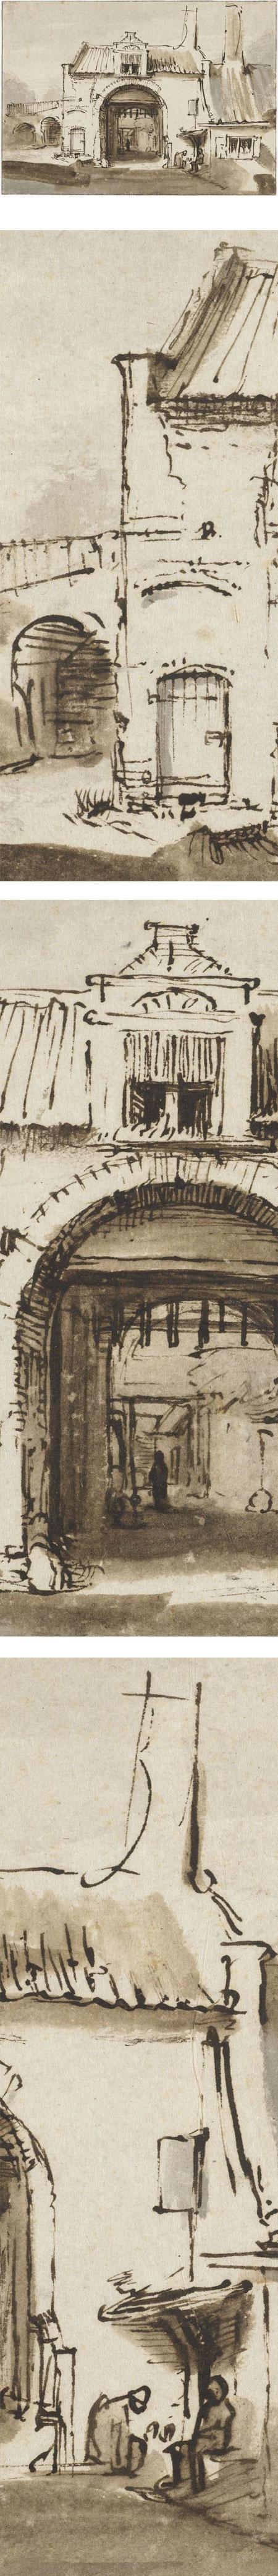 Stadspoort, Rembrandt Harmenz van Rijn, pen and wash drawing